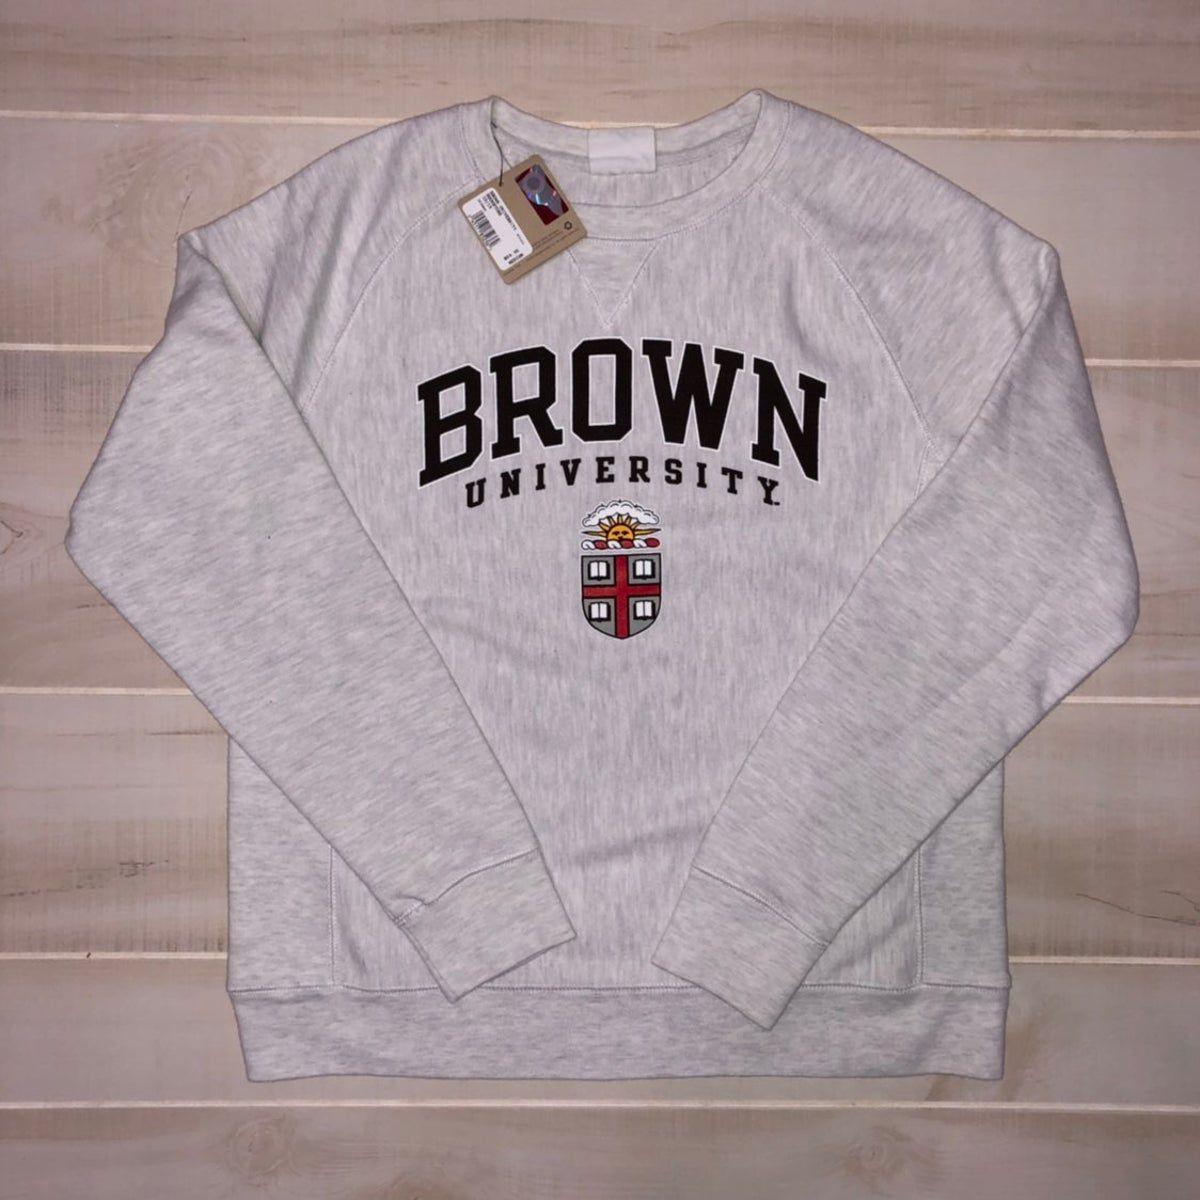 Brown University Crewneck Sweatshirt Sweatshirts Crew Neck Sweatshirt Brown University [ 1200 x 1200 Pixel ]